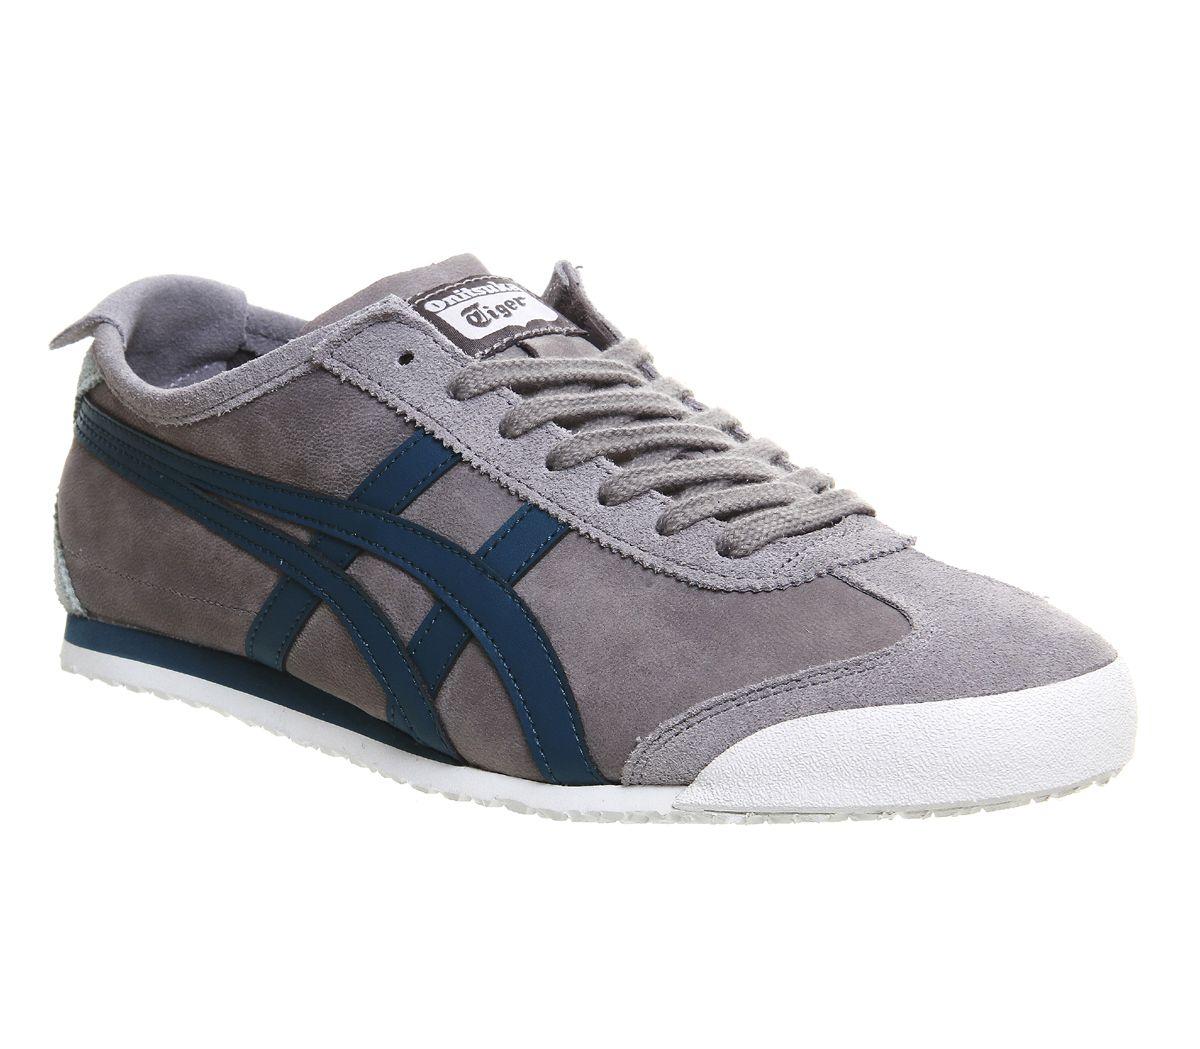 onitsuka tiger mexico 66 black blue uk grey leather